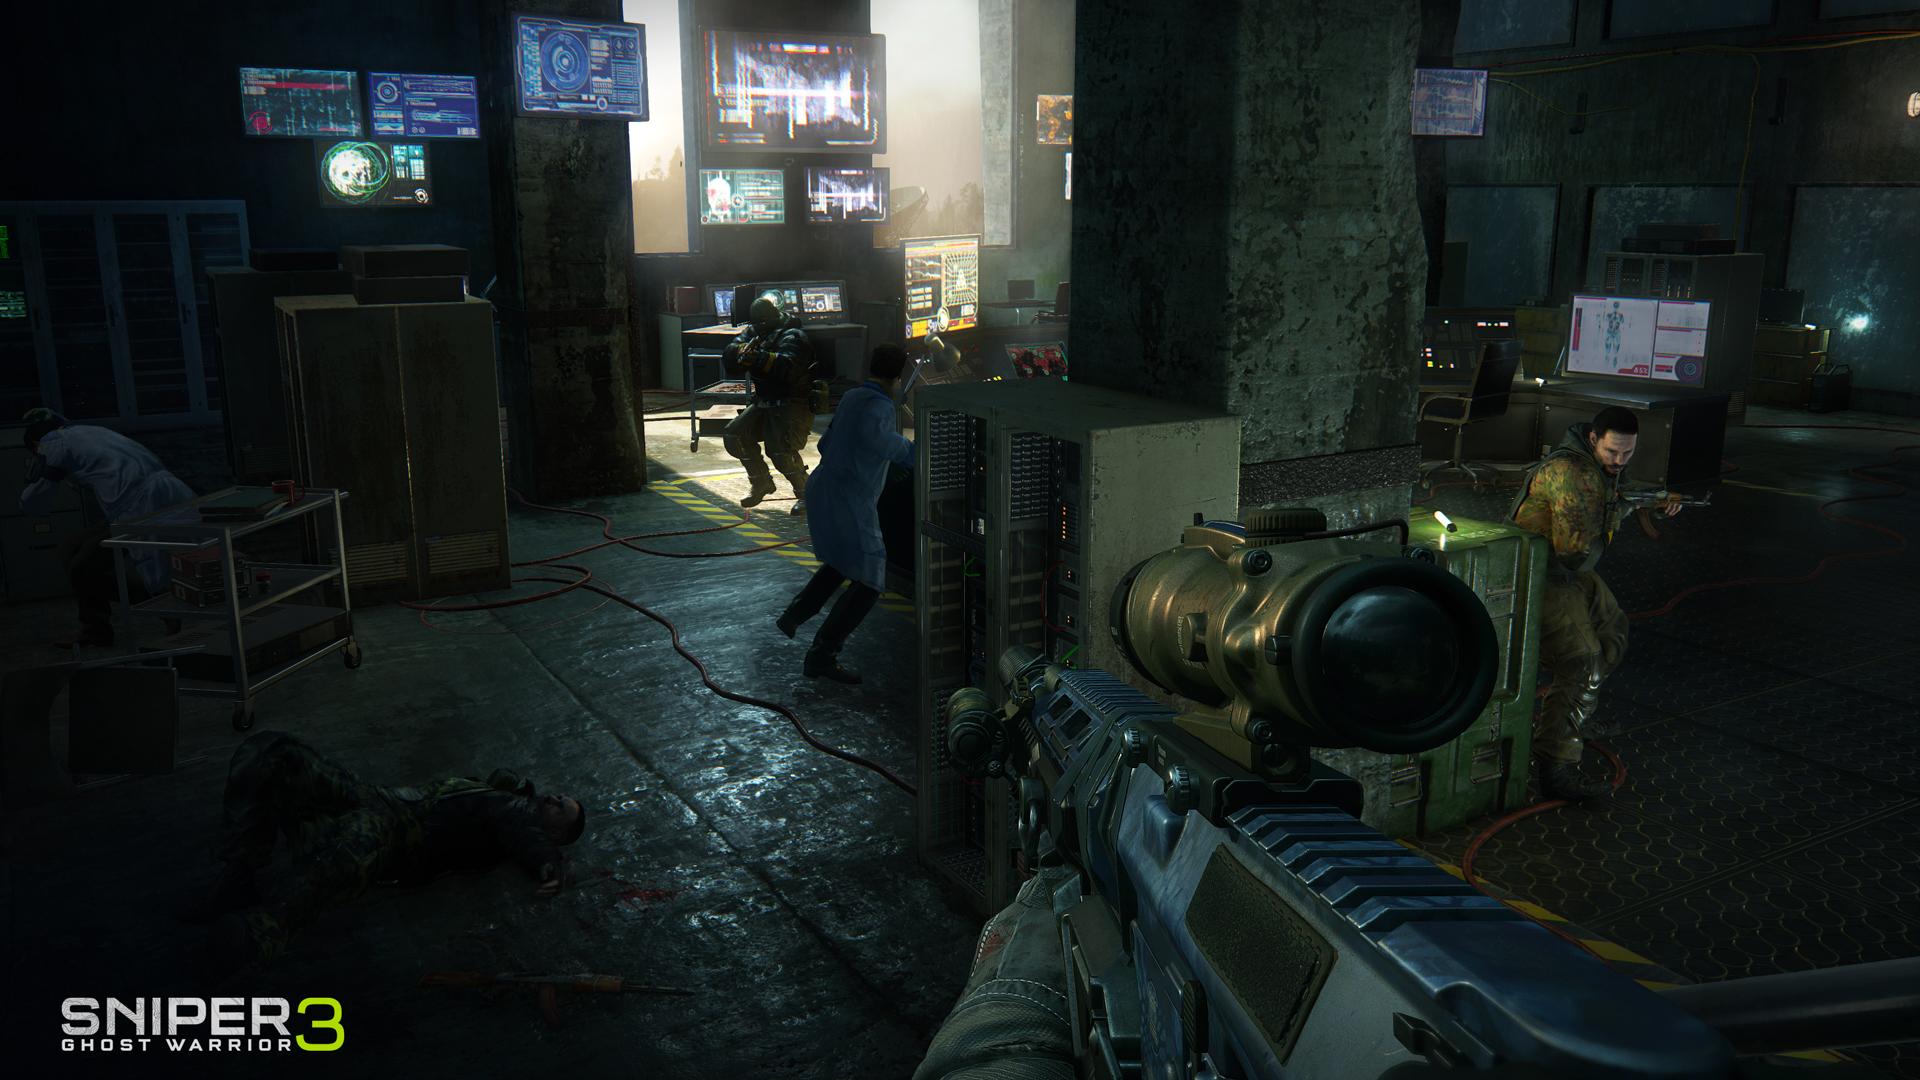 Sniper Ghost Warrior 3 , HD Wallpaper & Backgrounds